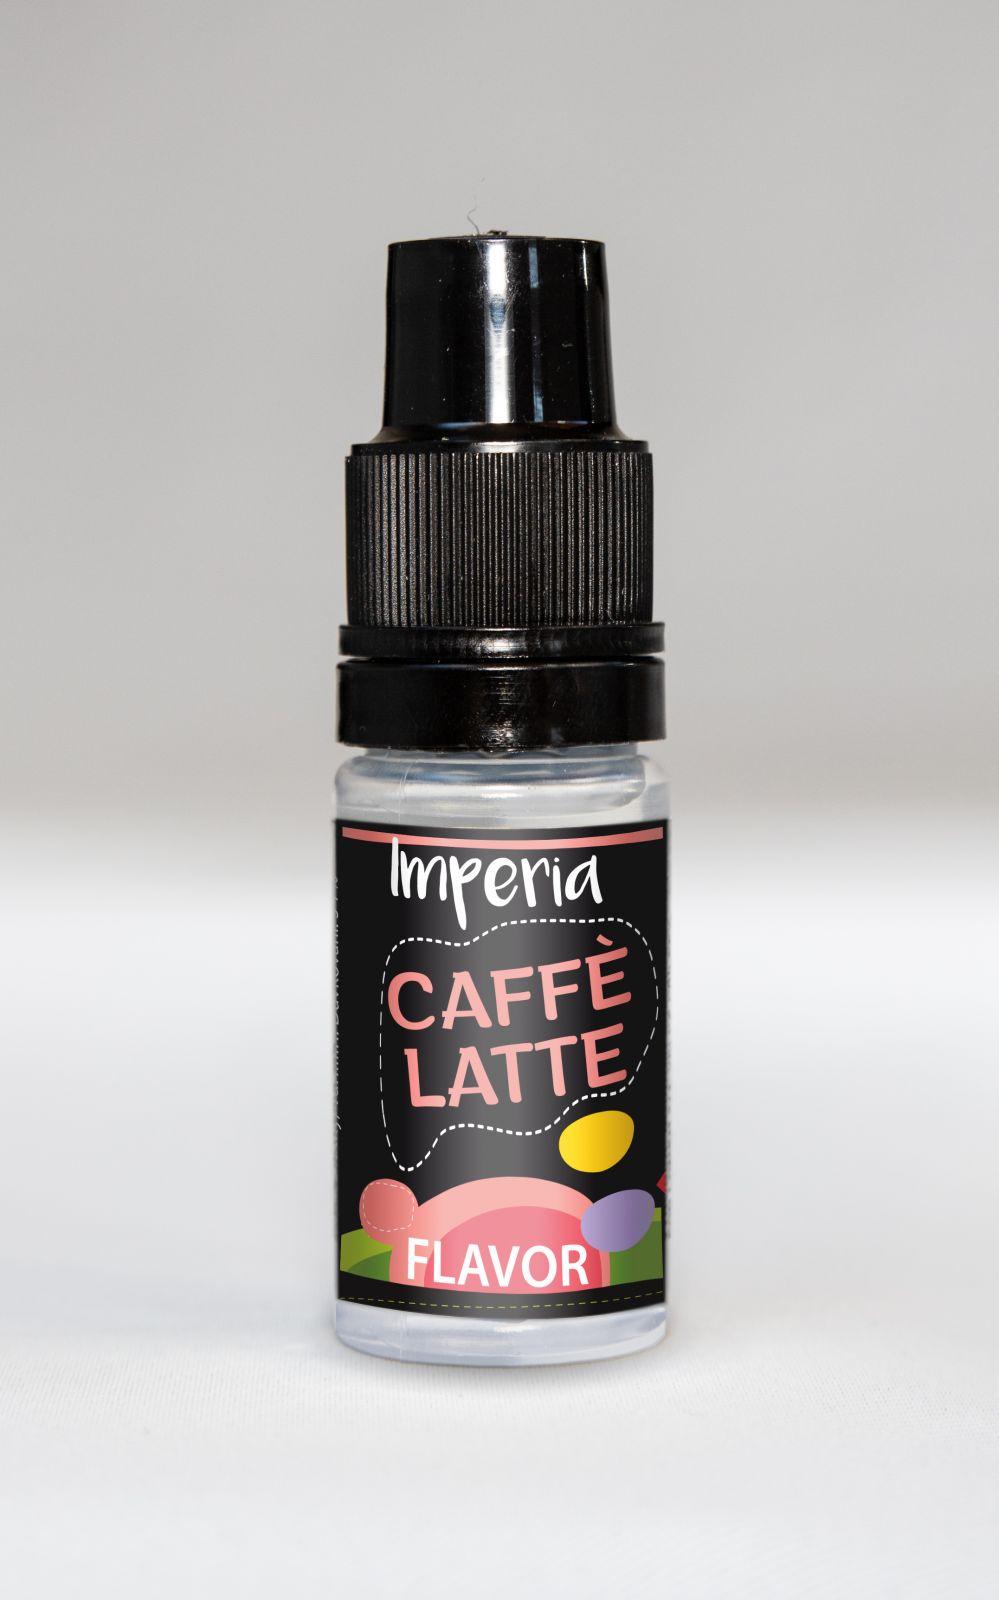 CAFFÉ LATTE - Aroma Imperia Black Label Boudoir Samadhi s.r.o.